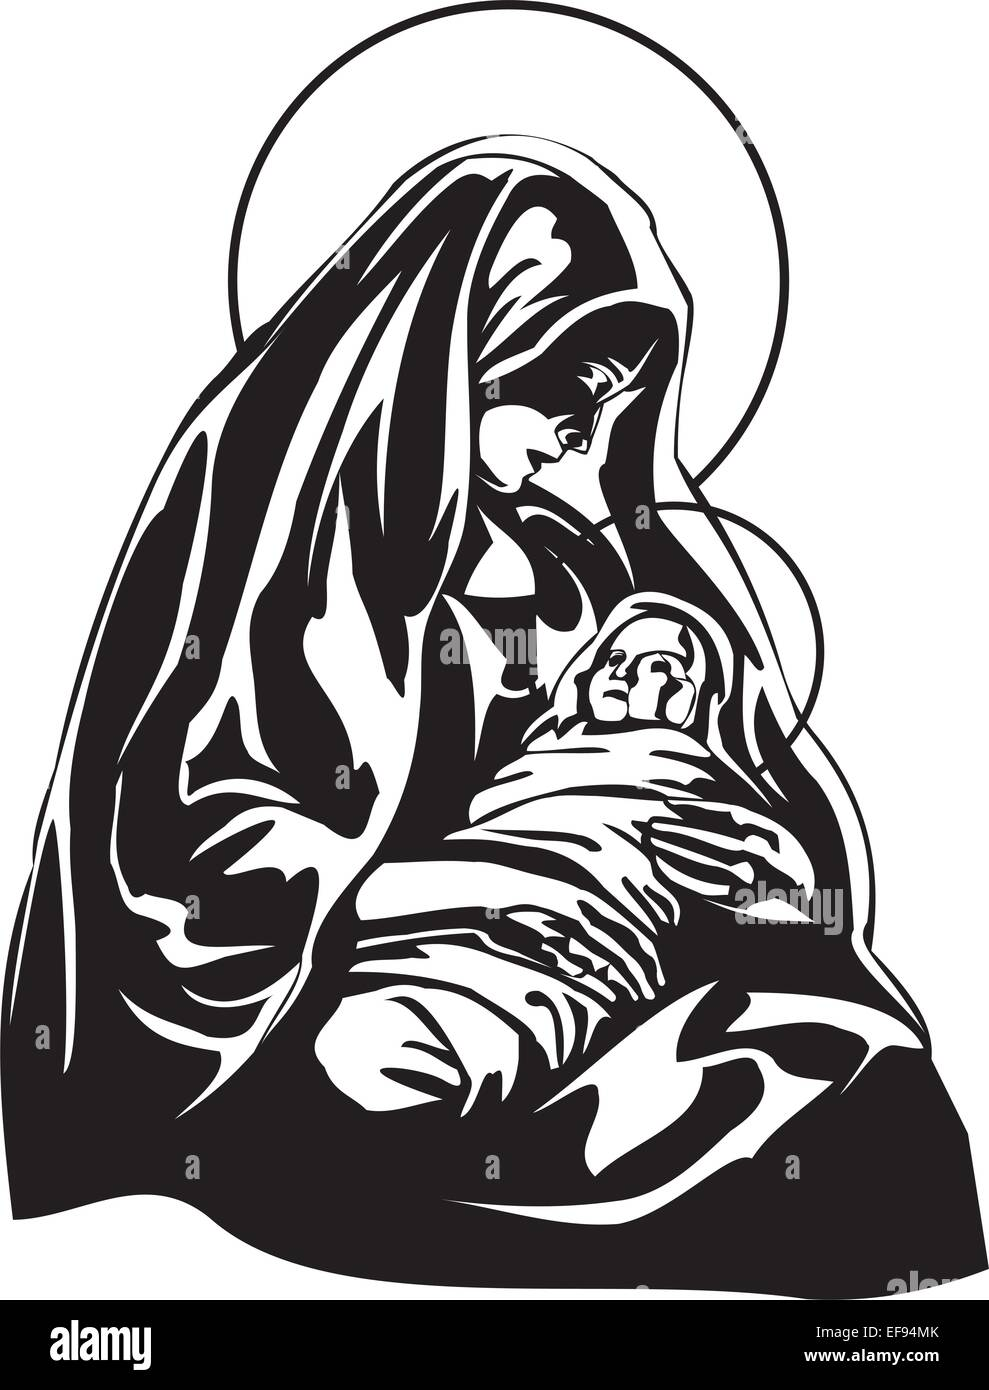 Mary Holding Baby Jesus - Stock Vector